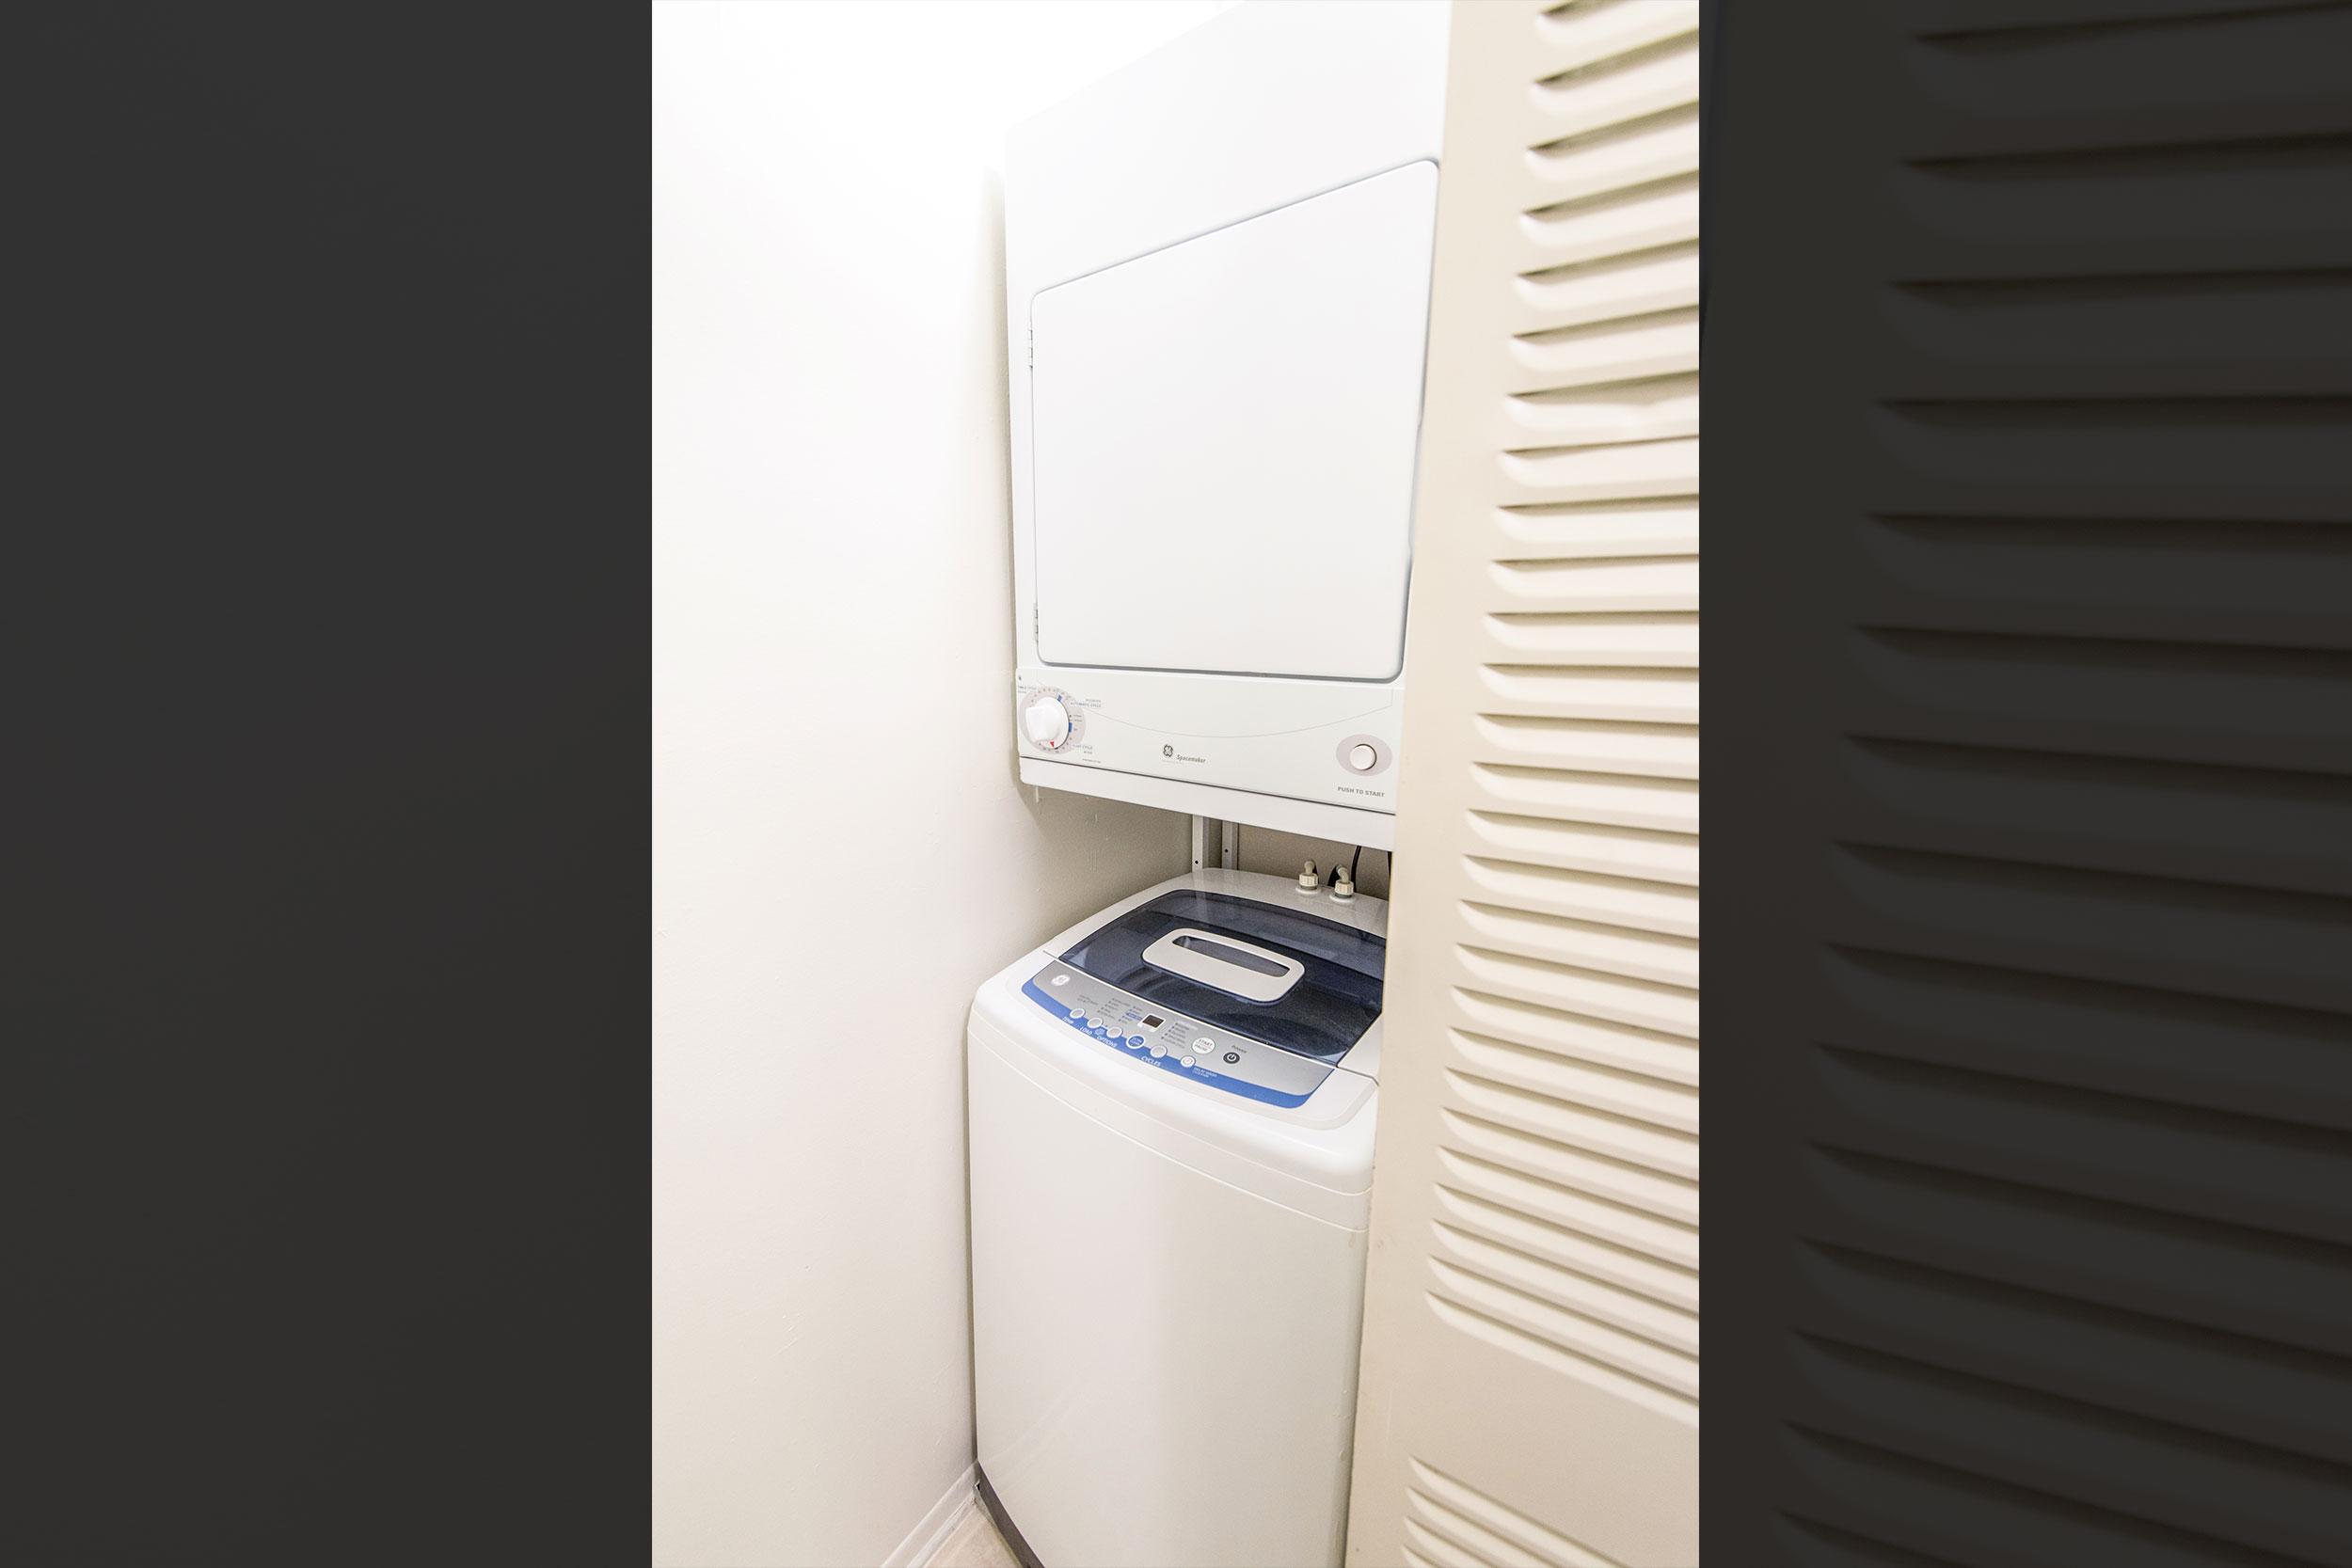 Mw-20laundry-202